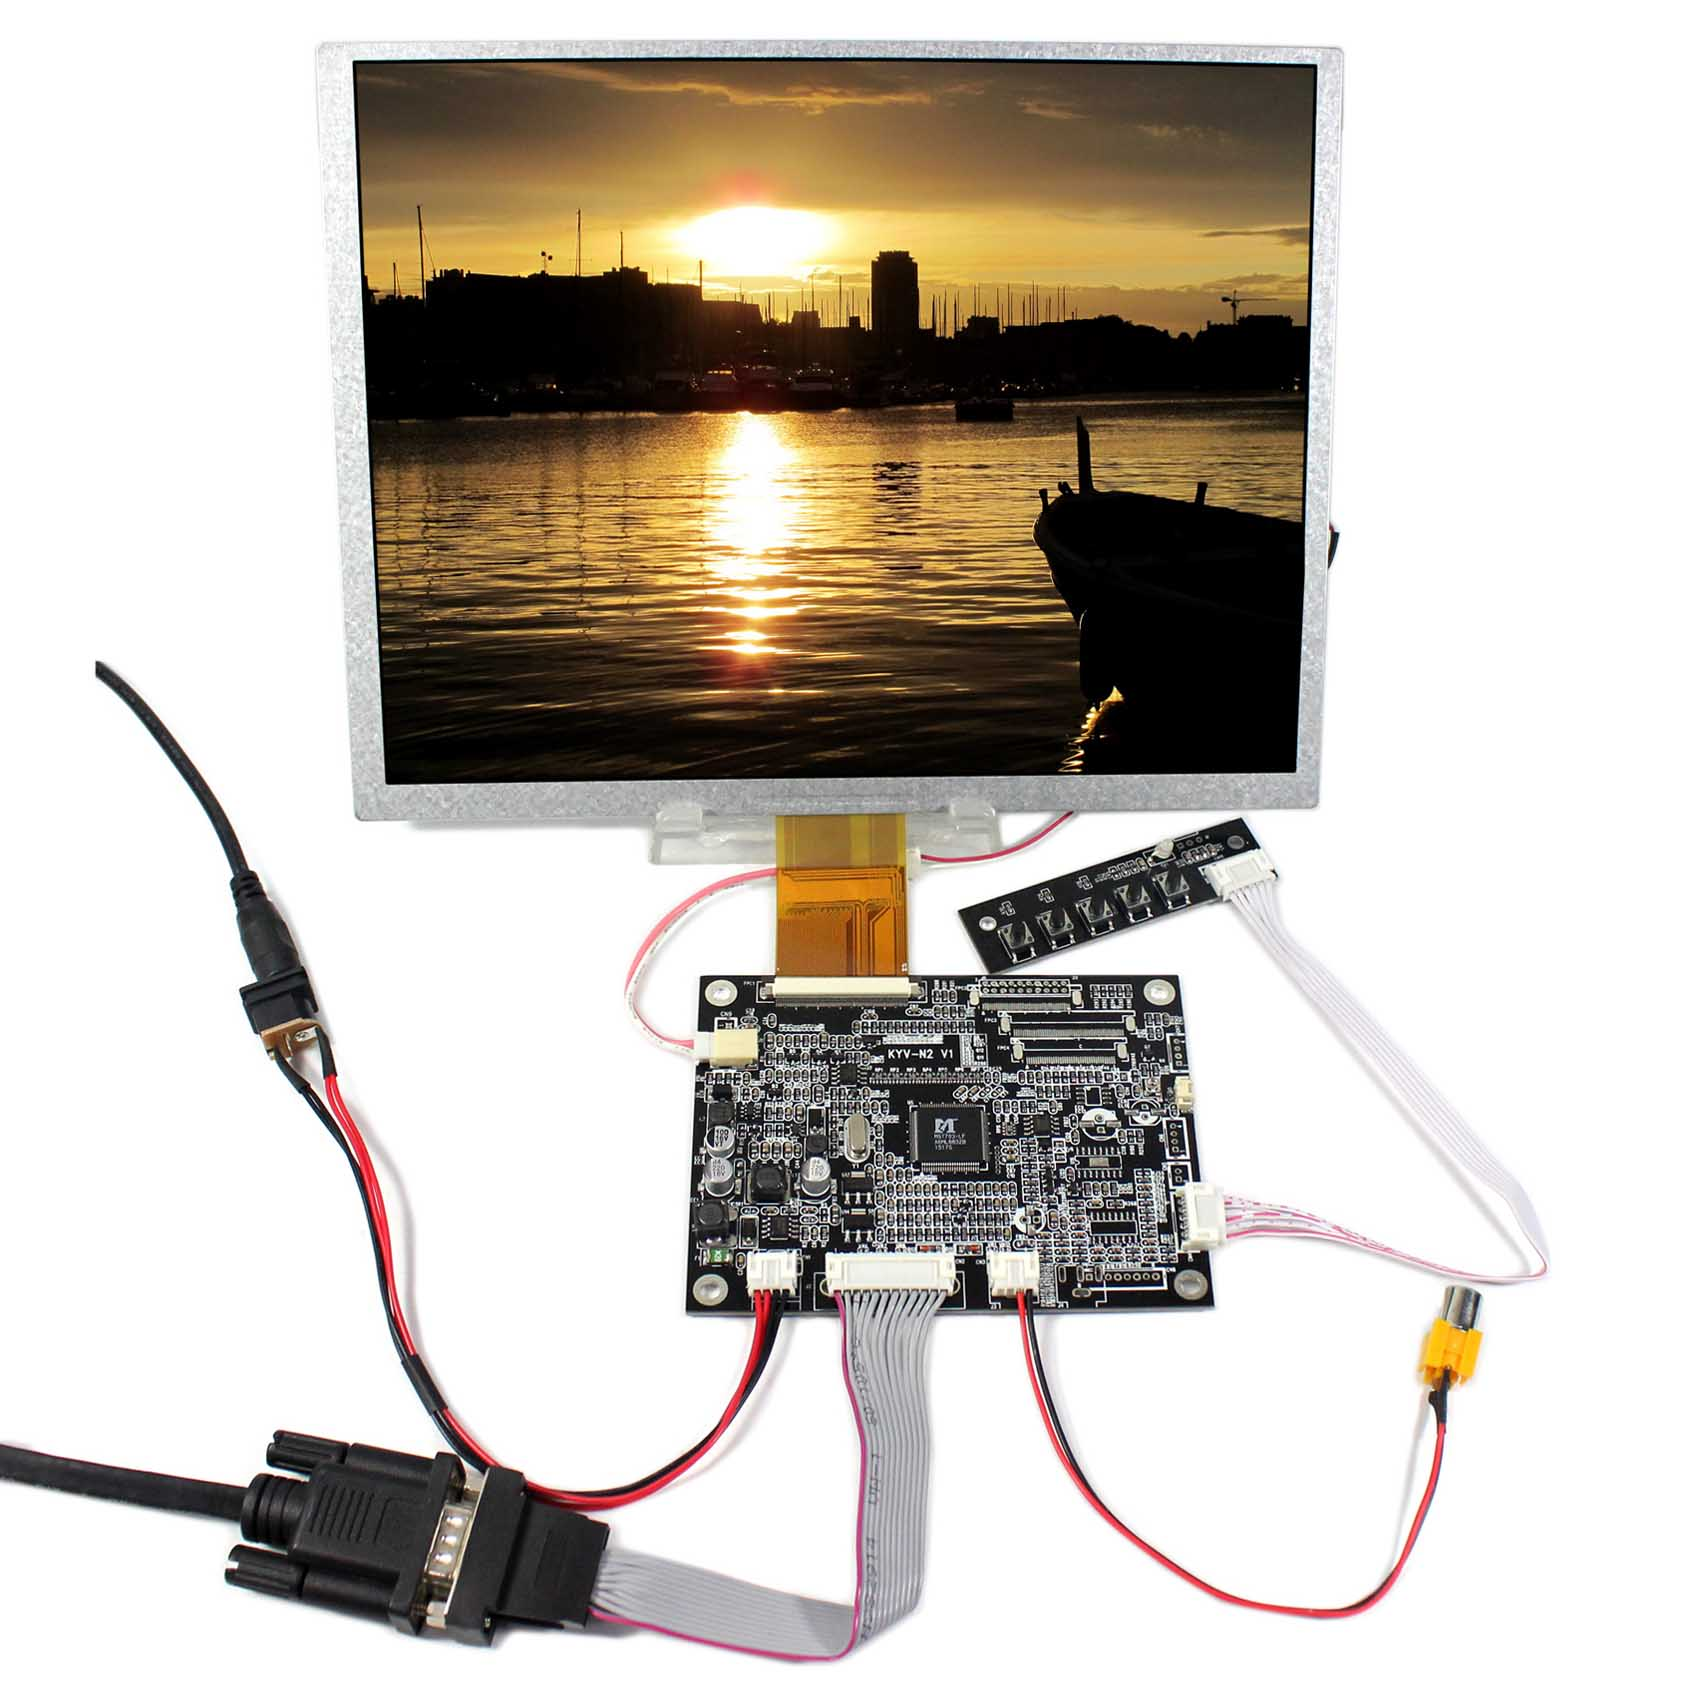 10.4inch 800x600 LSA40AT9001 LCD Replace A104SN03+VGA AV LCD Controller Board KYV-N2 V1 hdmi vga av audio lcd controller board kyv n3 v1 10 4inch lsa40at9001 800x600 lcd panel